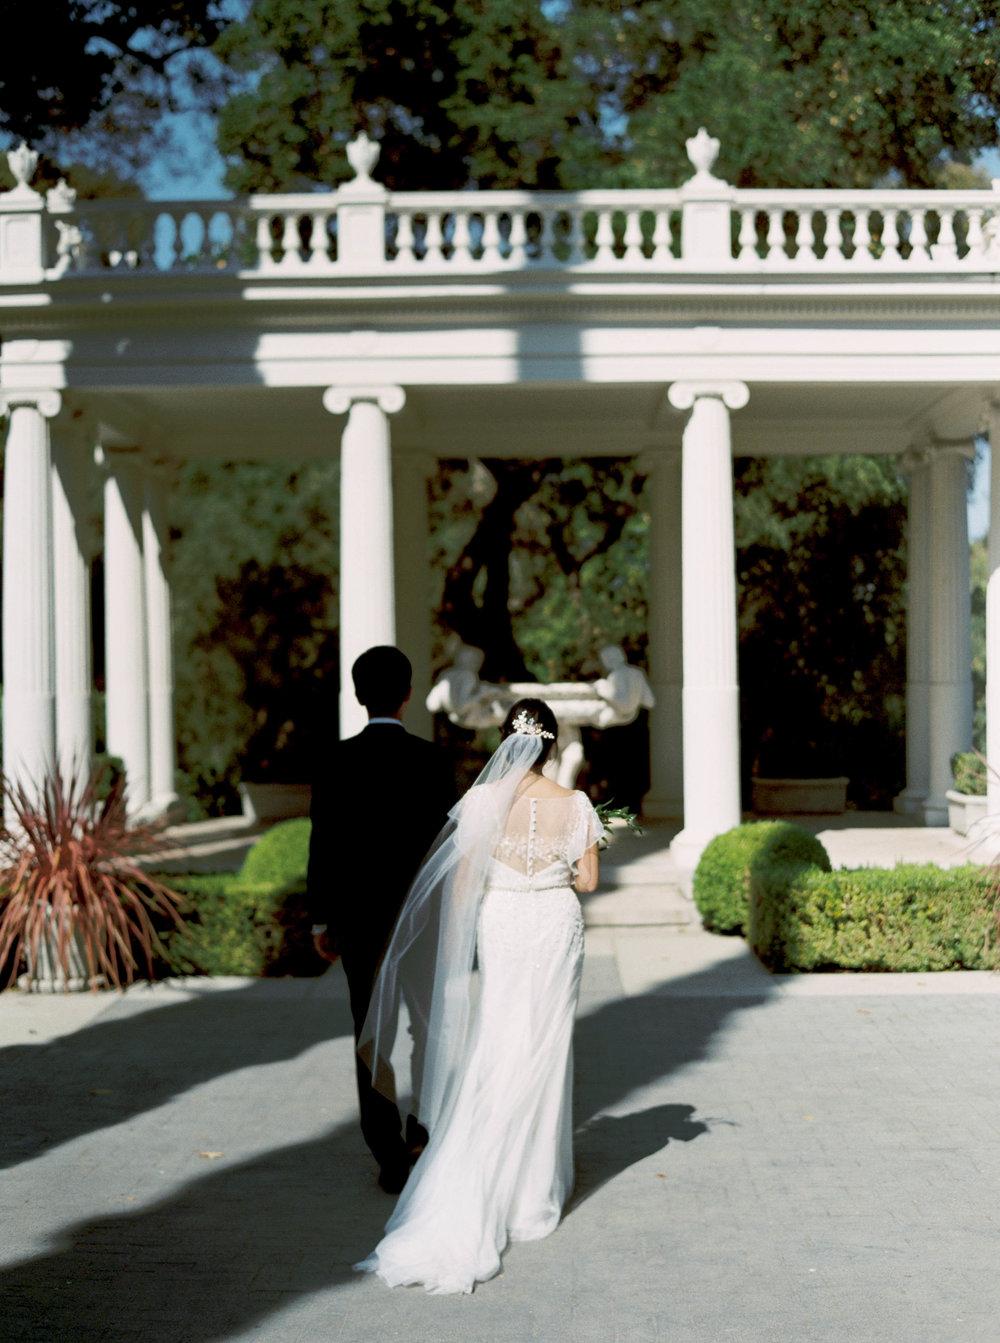 Villa_Montalvo_Wedding_Photographer_Videographer_San_Francisco083.jpg